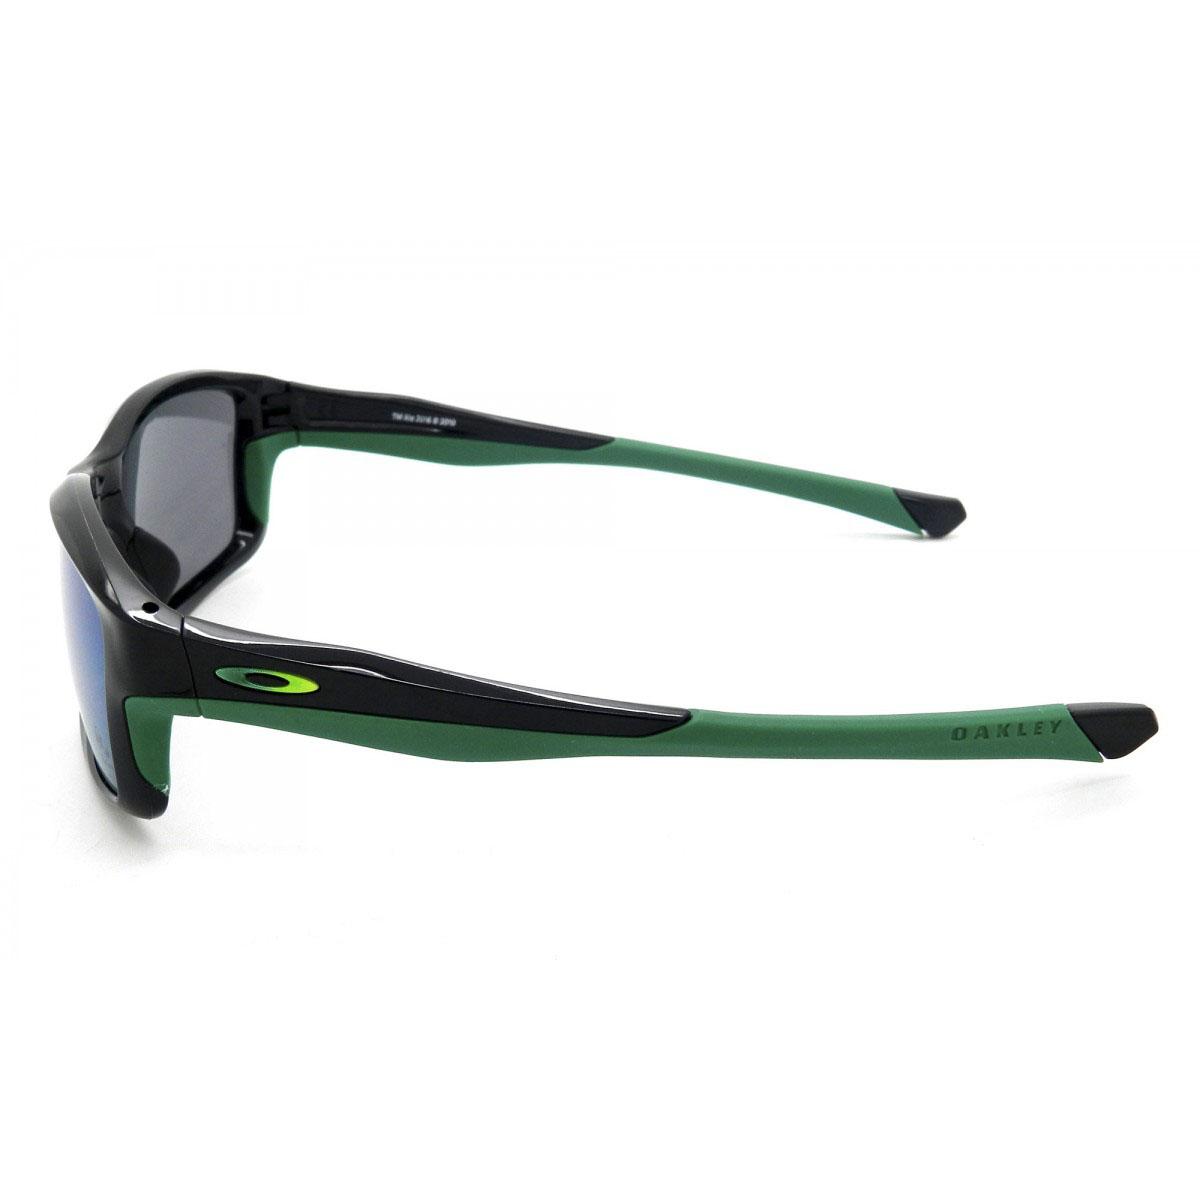 ... Óculos Oakley Chainlink Olimpics Collection Polished Black Lente Jade  Iridium ... 7fd05cb321